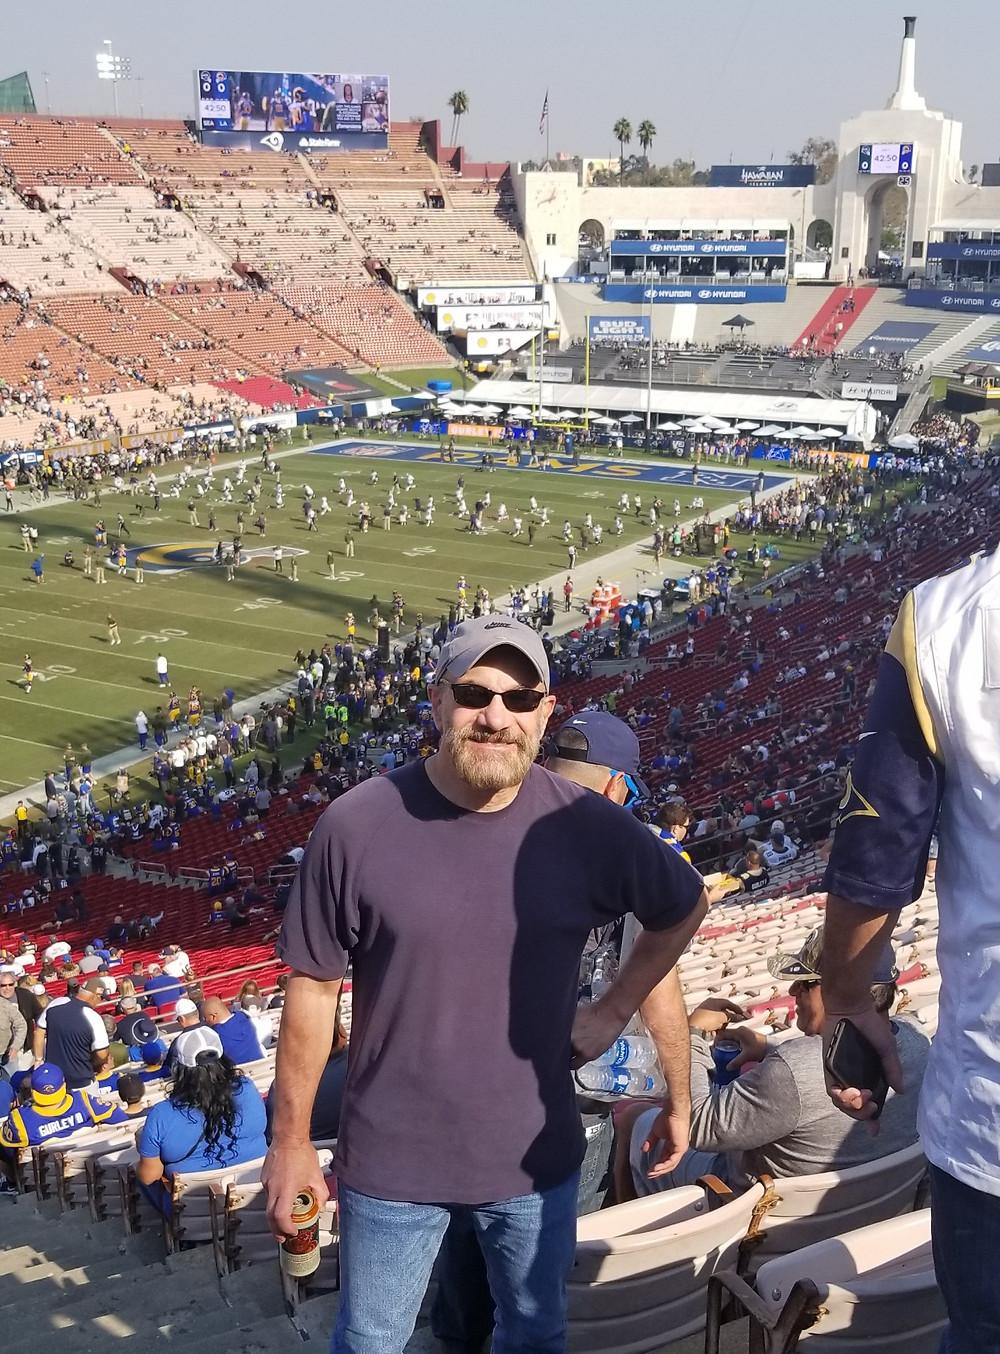 Los Angeles Memorial Coliseum Review